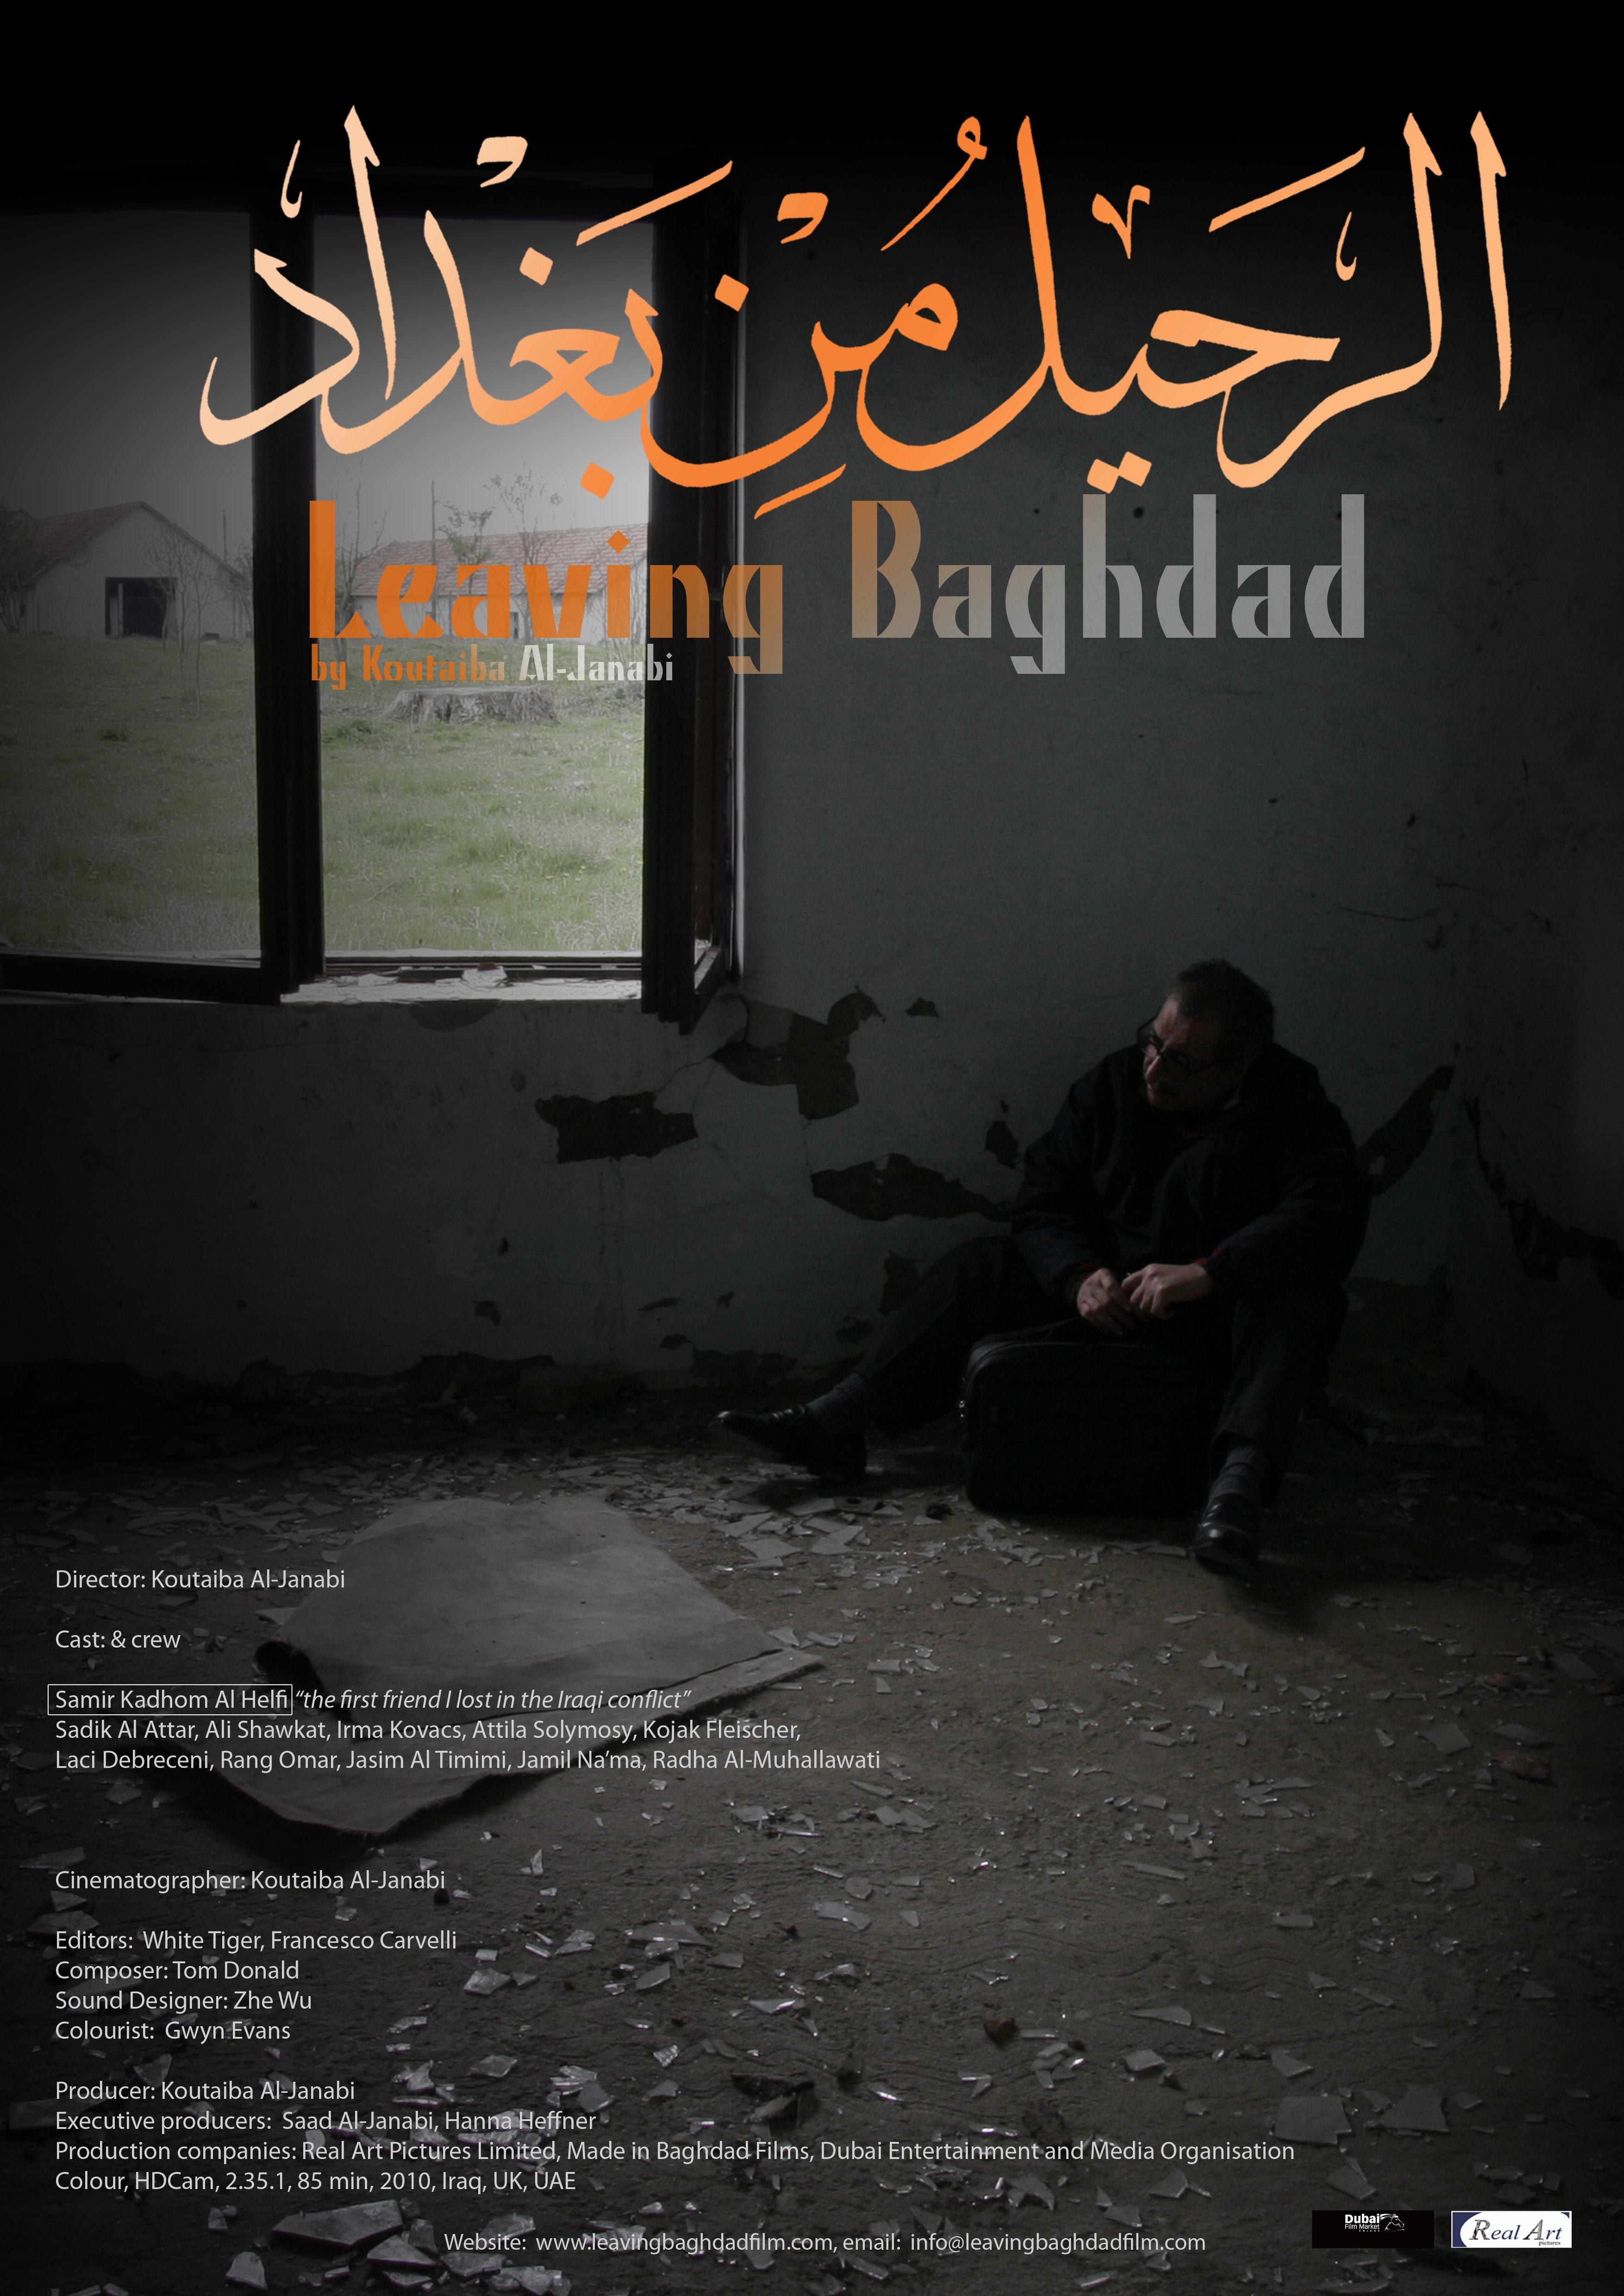 La locandina di Leaving Baghdad